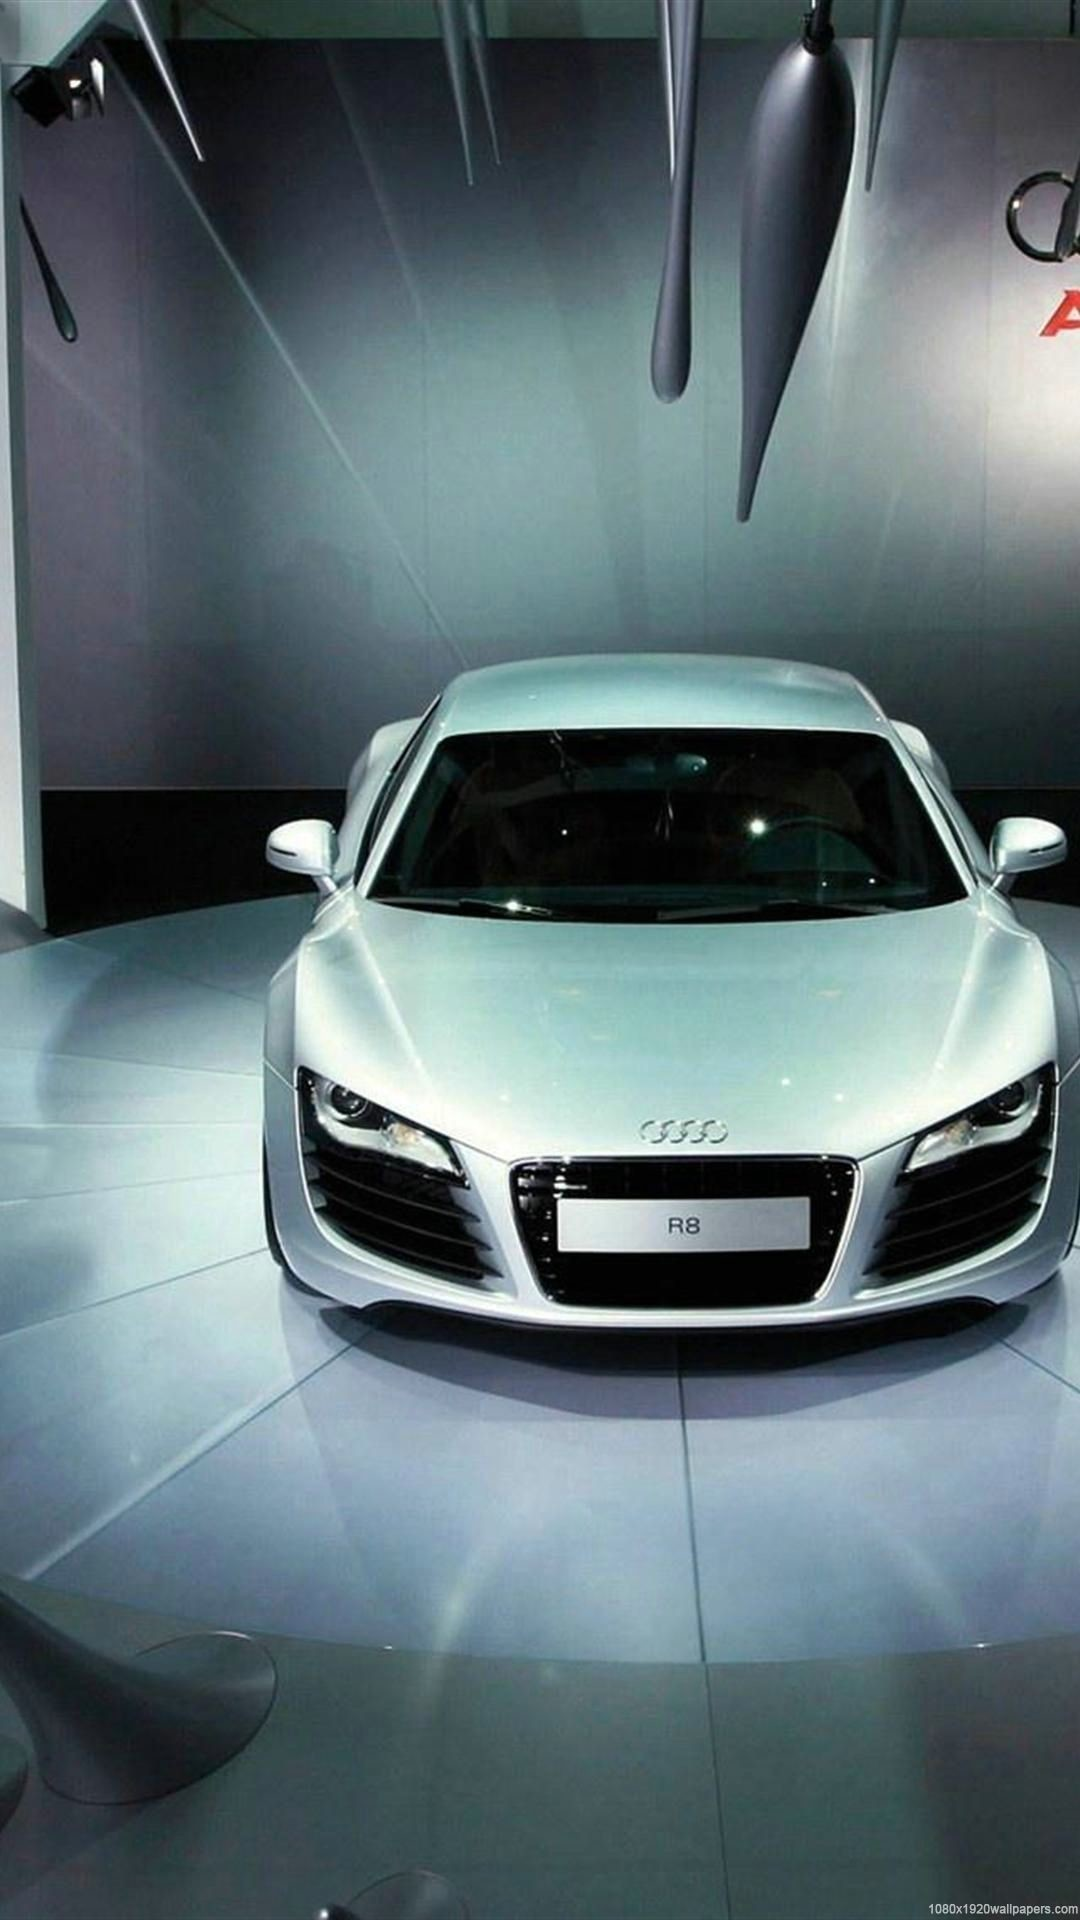 Audi R8 Wallpaper Iphone 6 Cool Car Wallpapers Hd 1080p 72 Images